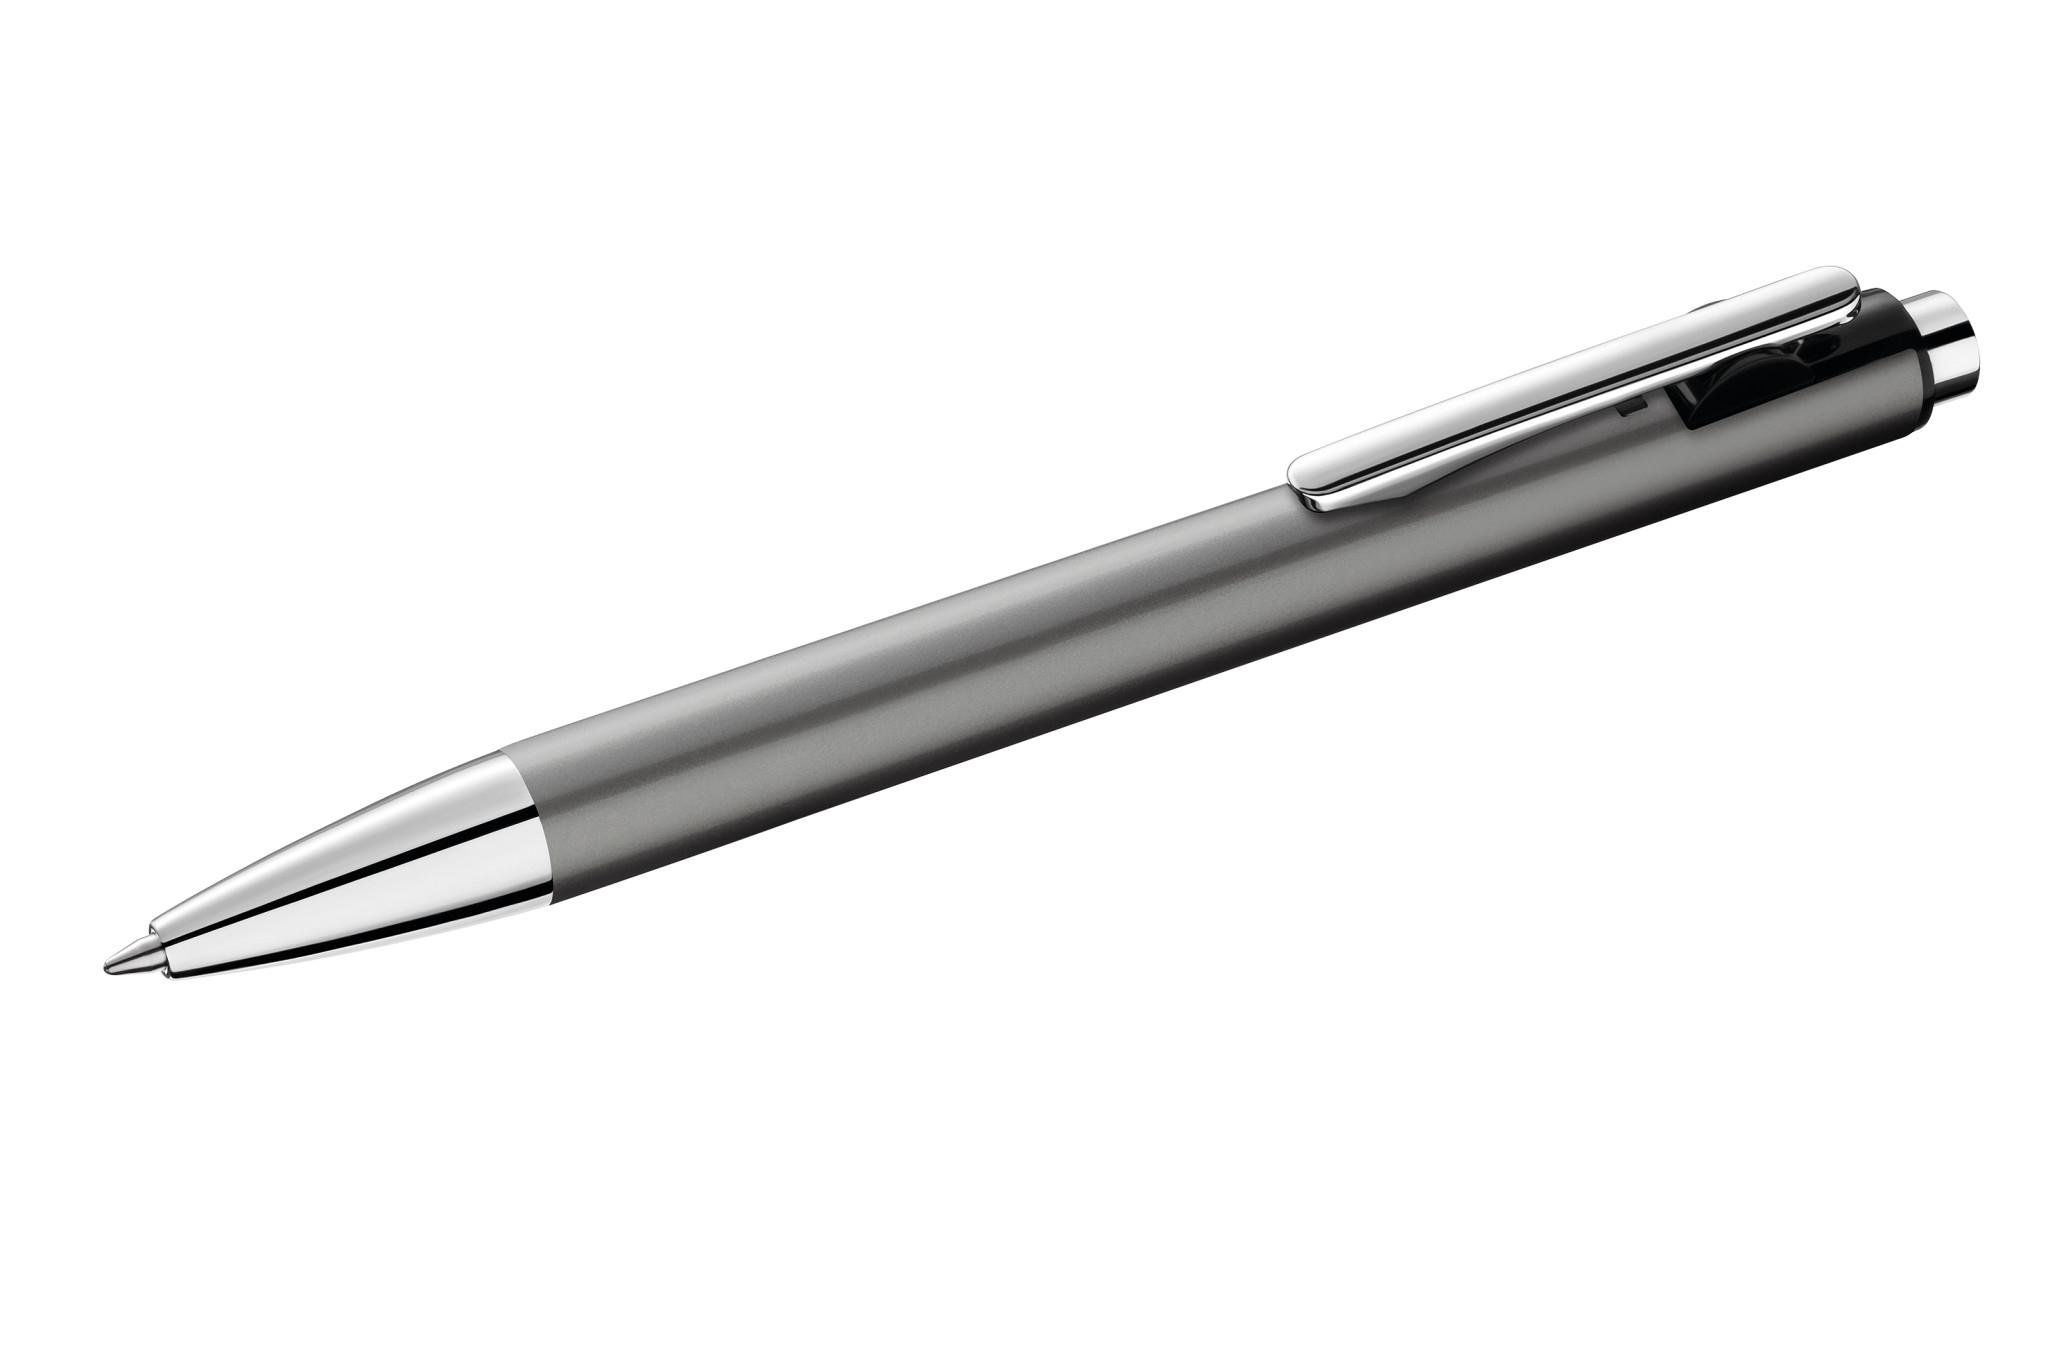 Vorschau: Pelikan Snap - Clip - Clip-on-Einziehkugelschreiber - Nachfüllbar - Blau - 1 Stück(e) - Medium